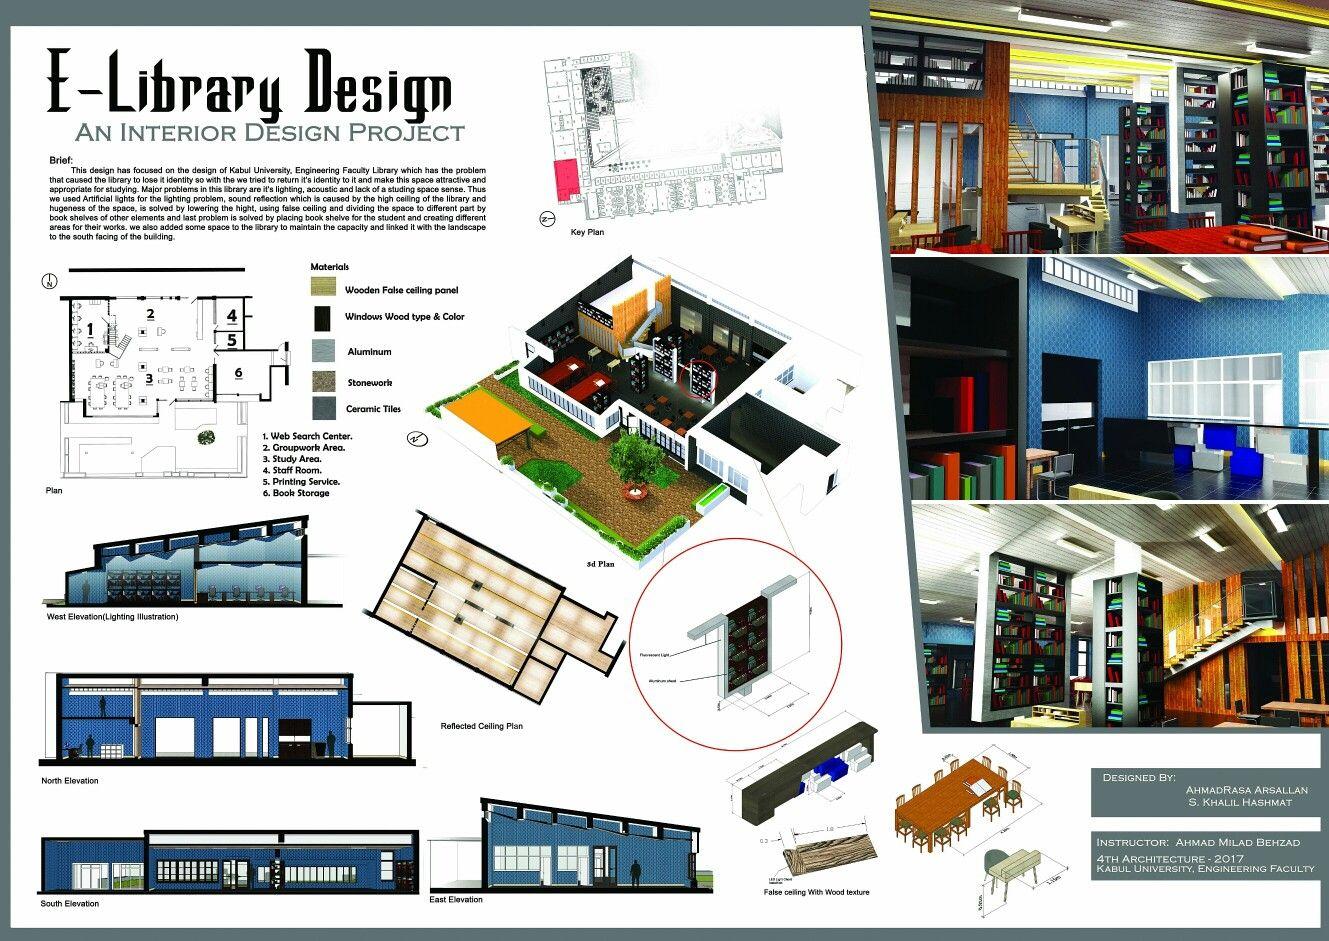 Kabul university, enigeering library interior design poster ...